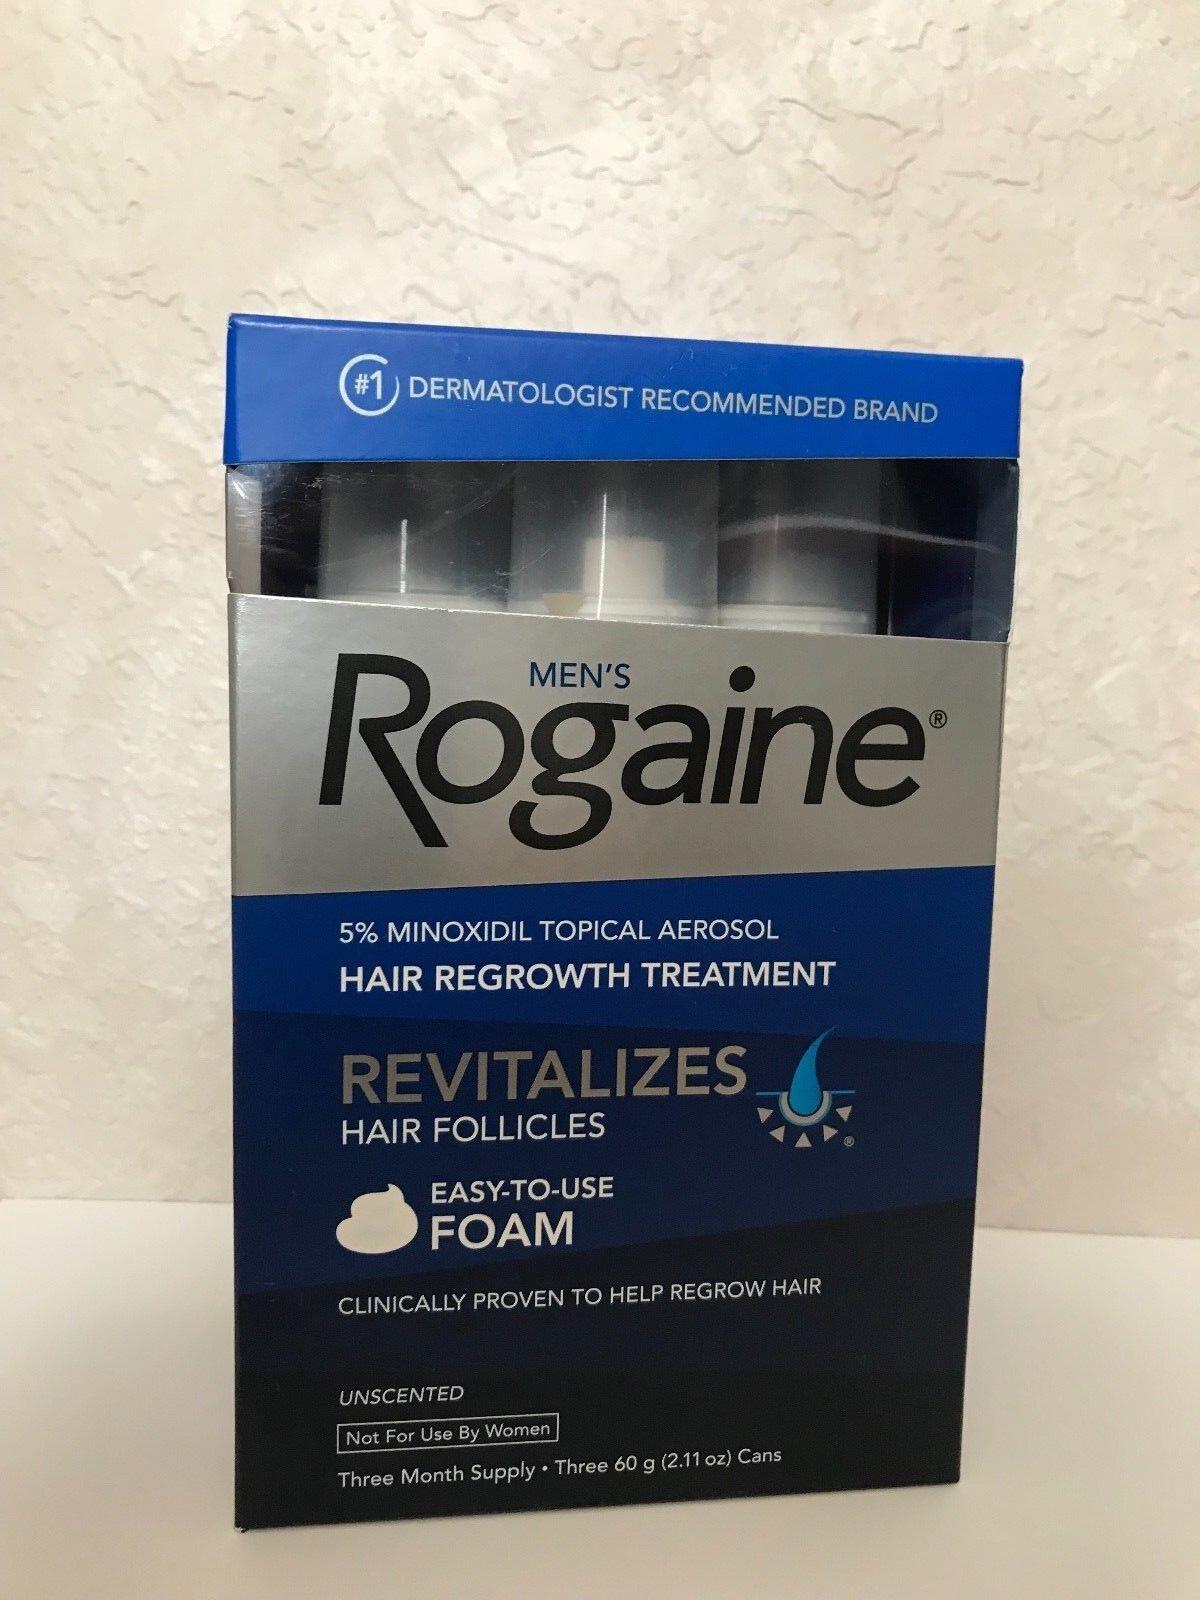 Men's Rogaine 5% Minoxidil Hair Regrowth Treatment Foam - 3